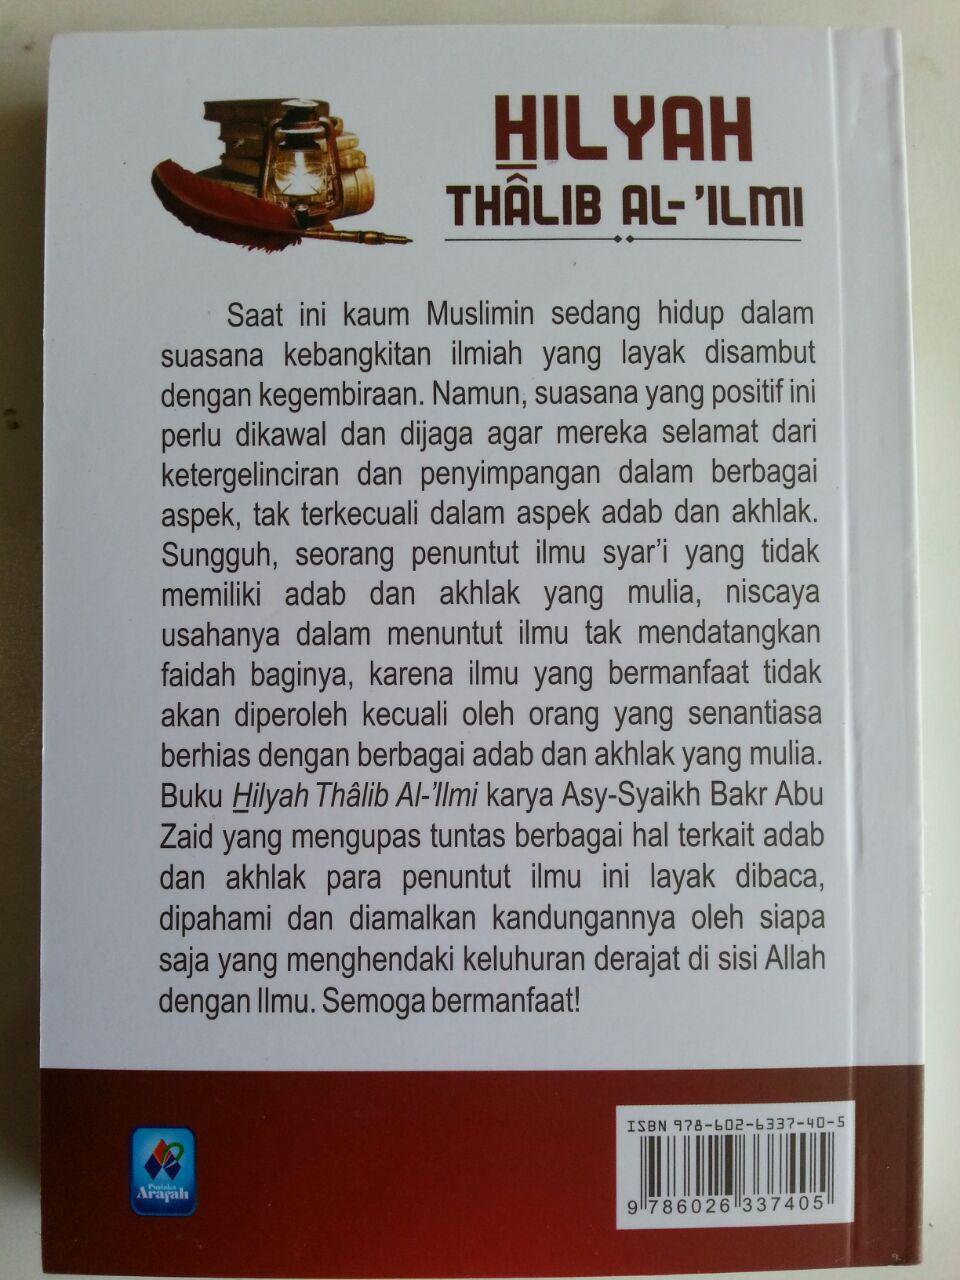 Buku Hilyah Thalib Al-Ilmi Pedoman Adab Akhlak Penuntut Ilmu cover